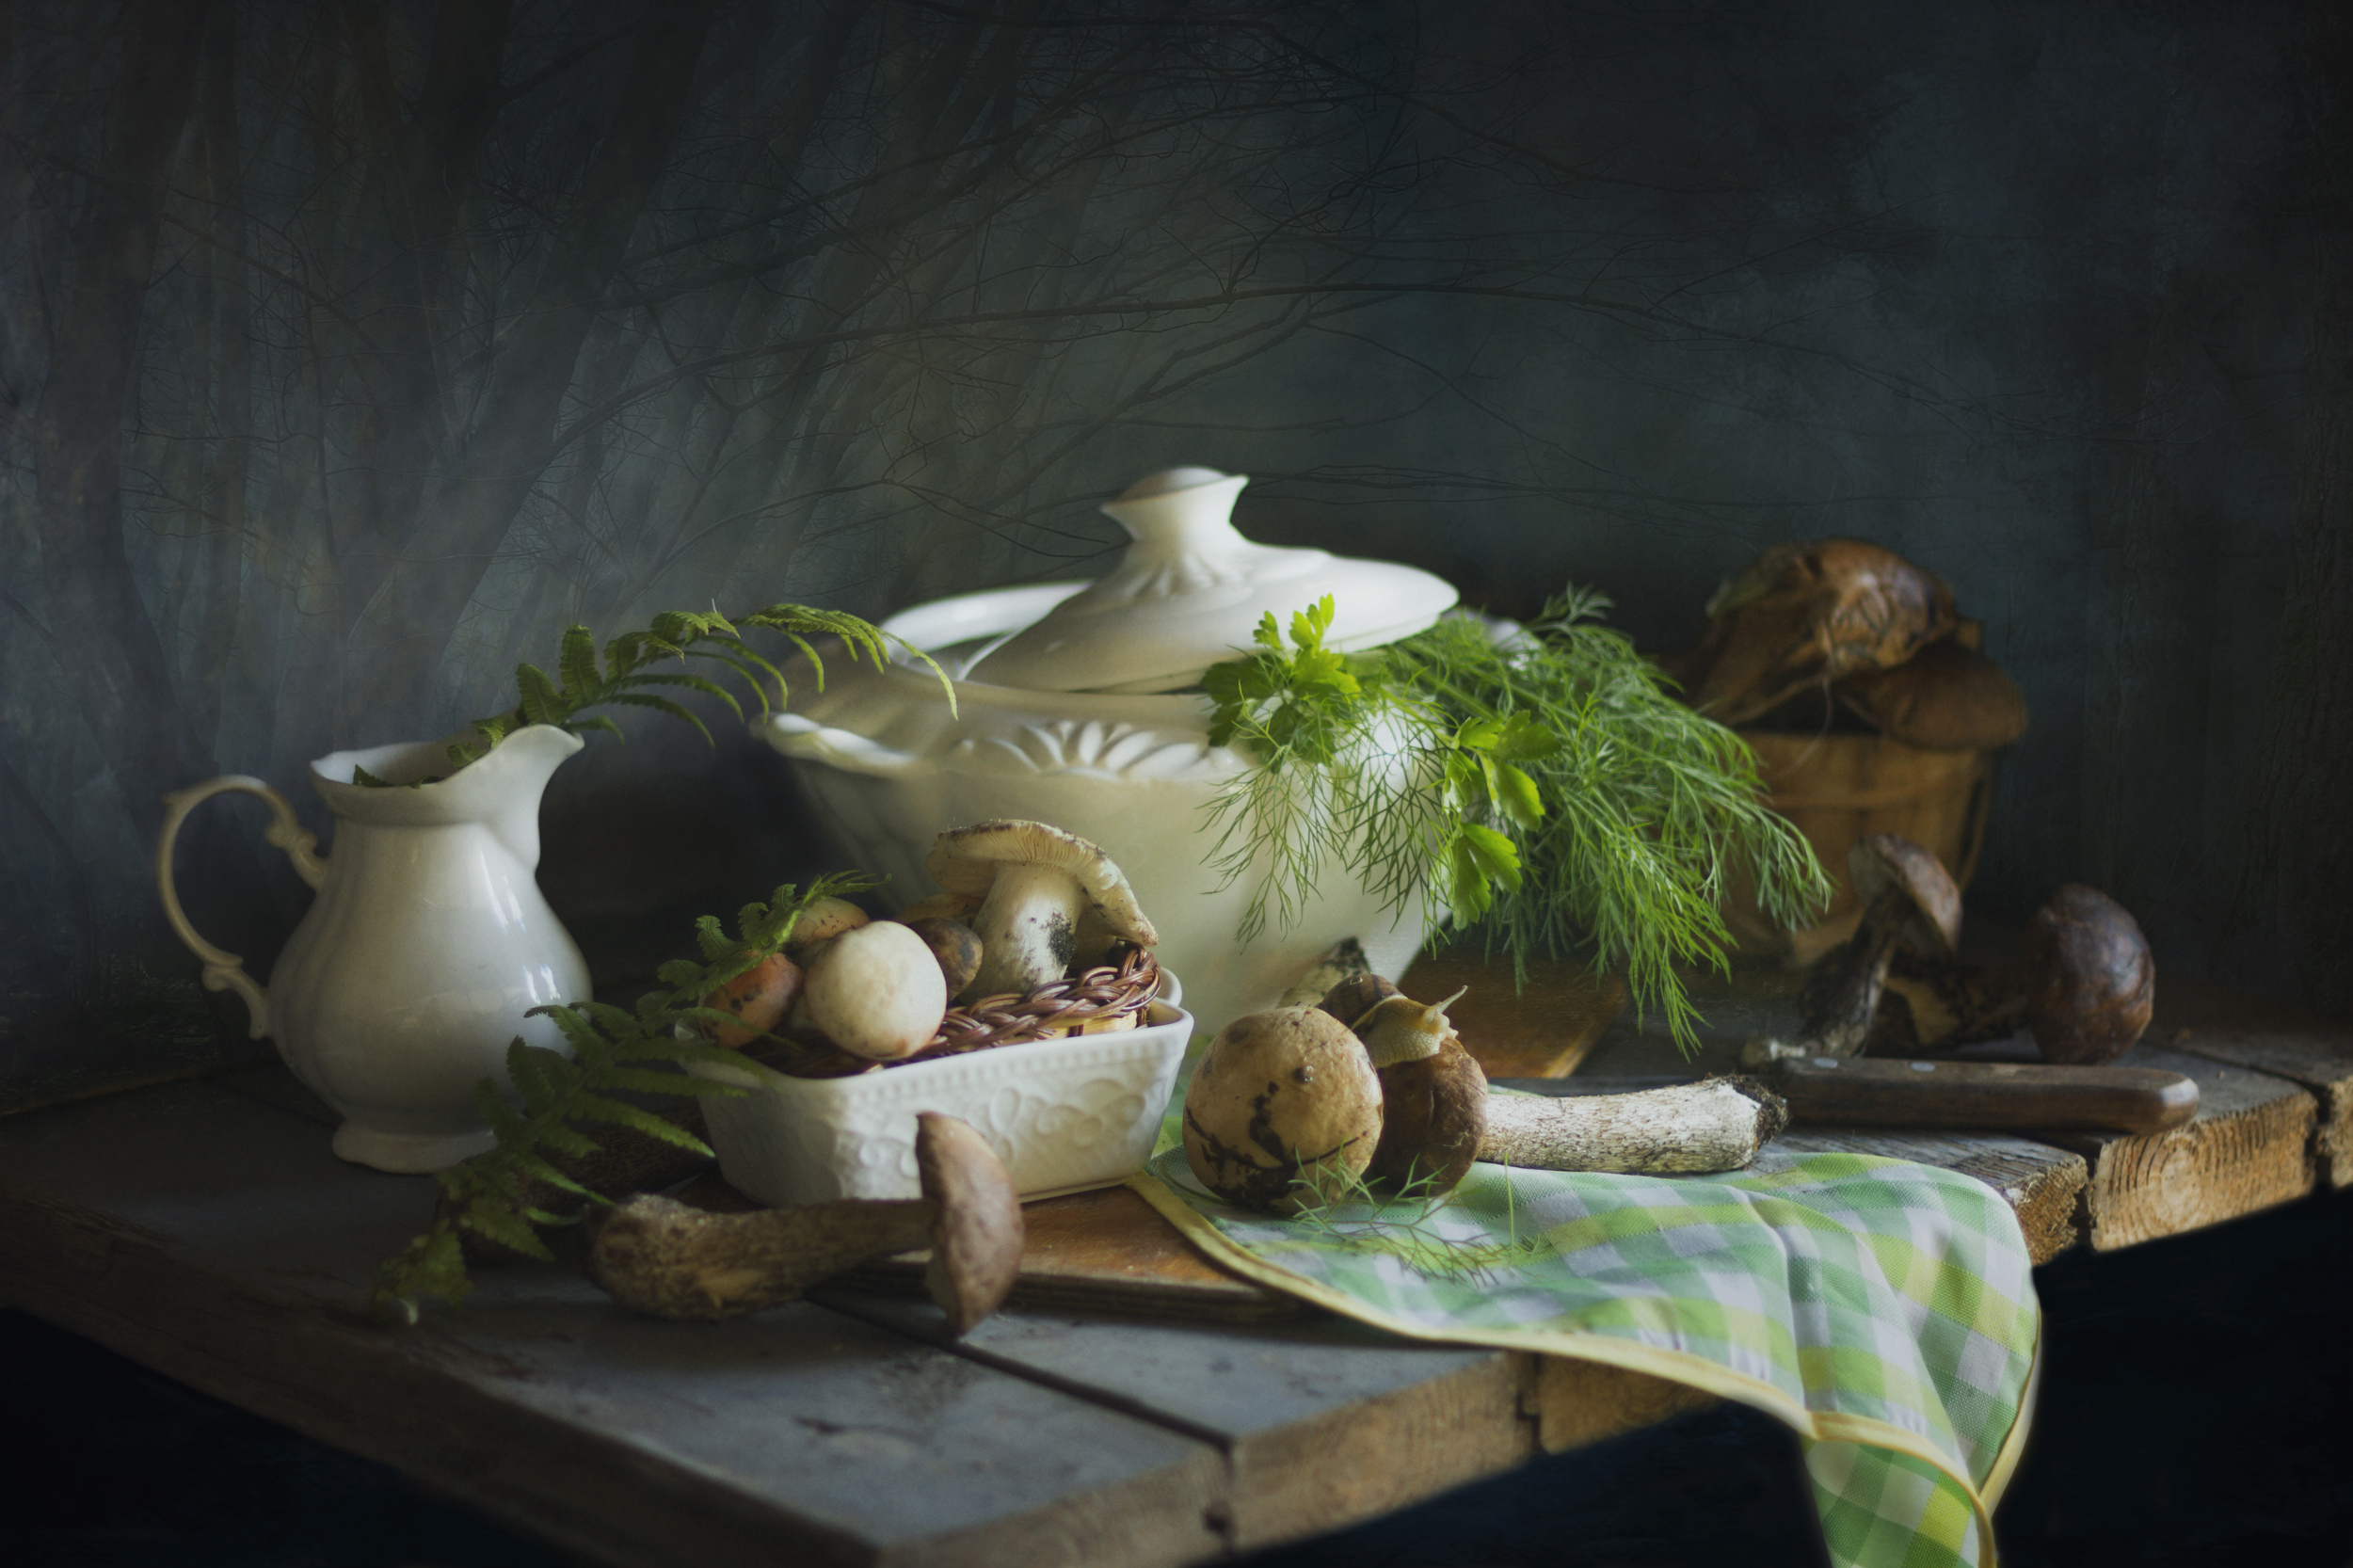 грибы, лес, натюрморт, супница, Зимина Лионелла